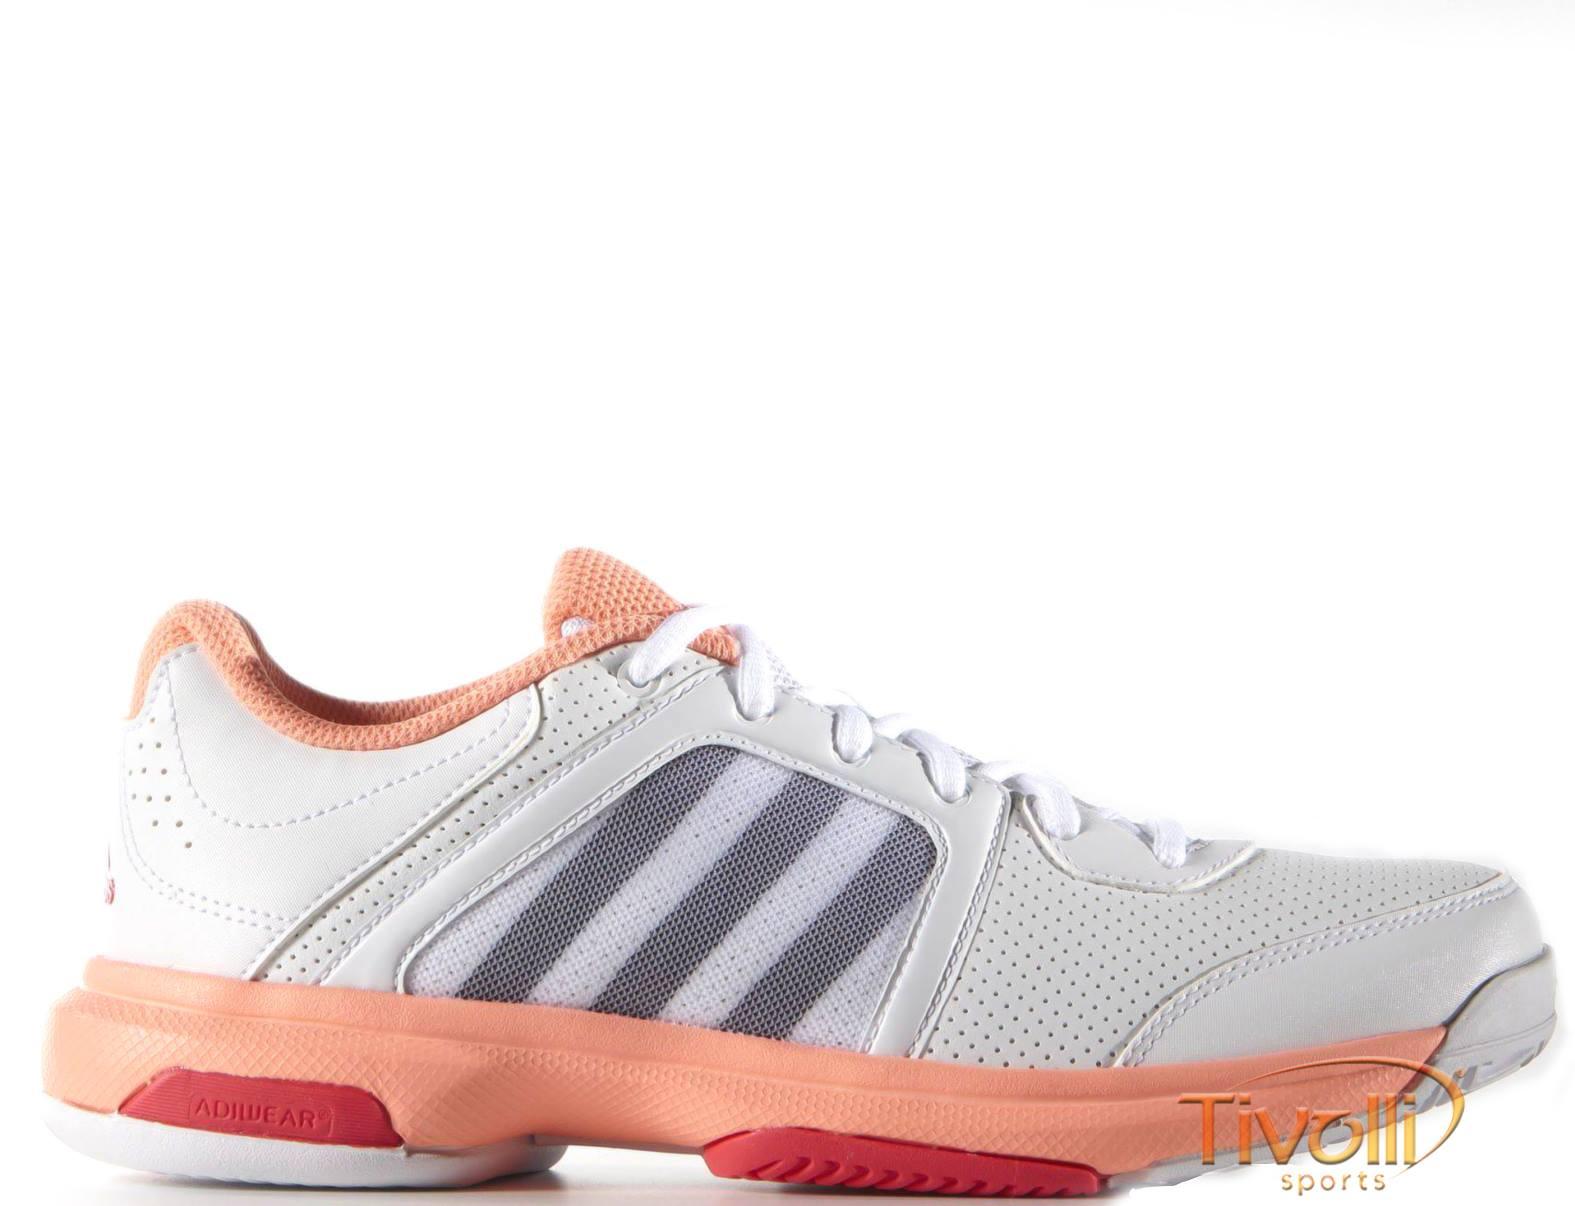 fd47b76c6ba Tênis Adidas Barricade Aspire STR   feminino branco